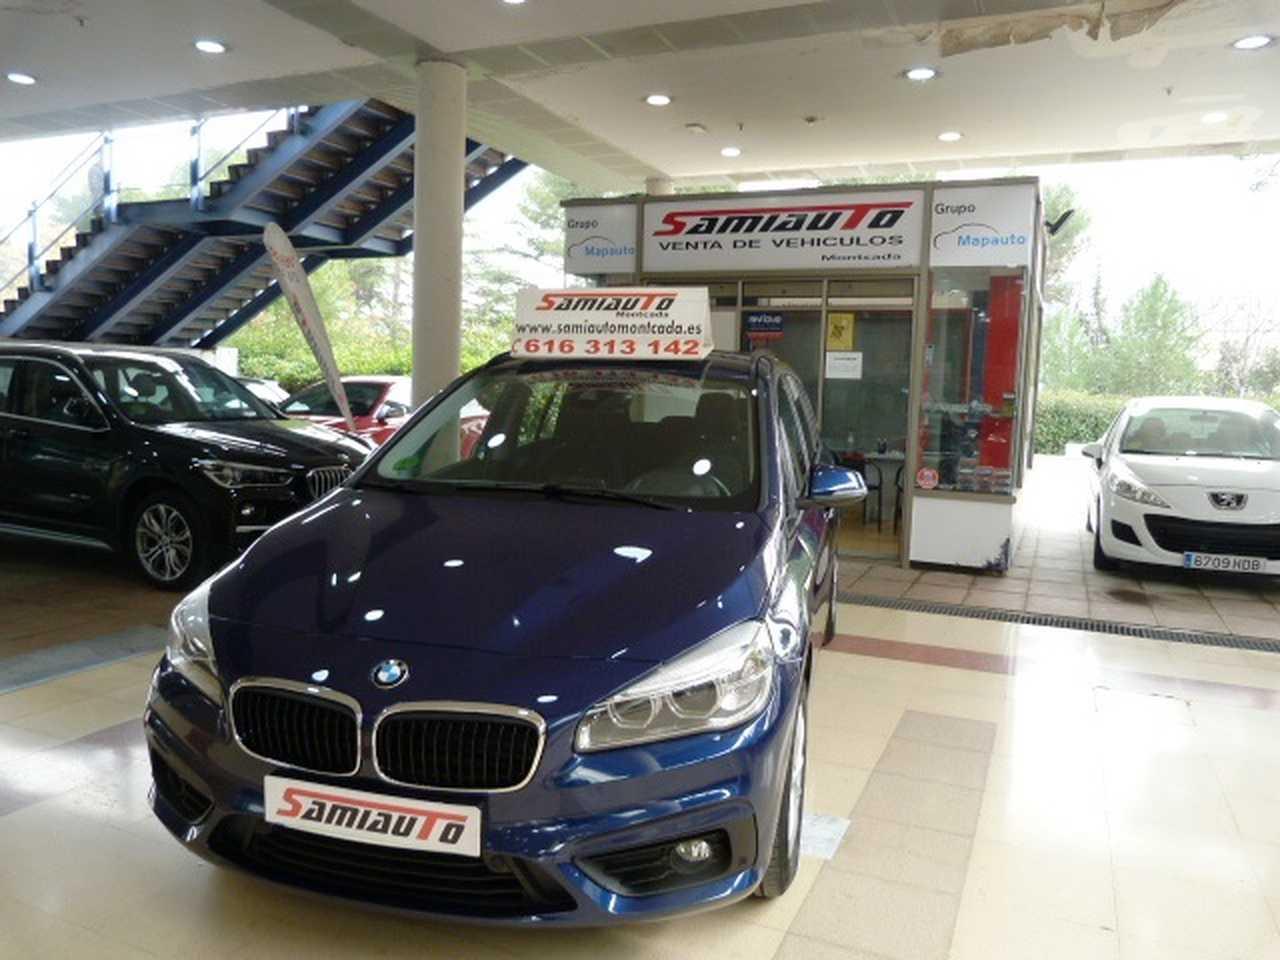 BMW Serie 2 Gran Tourer Serie 2 Gran Tourer 218d 5p UN SOLO PROPIETARIO LIBRO DE REVISIONES  - Foto 1